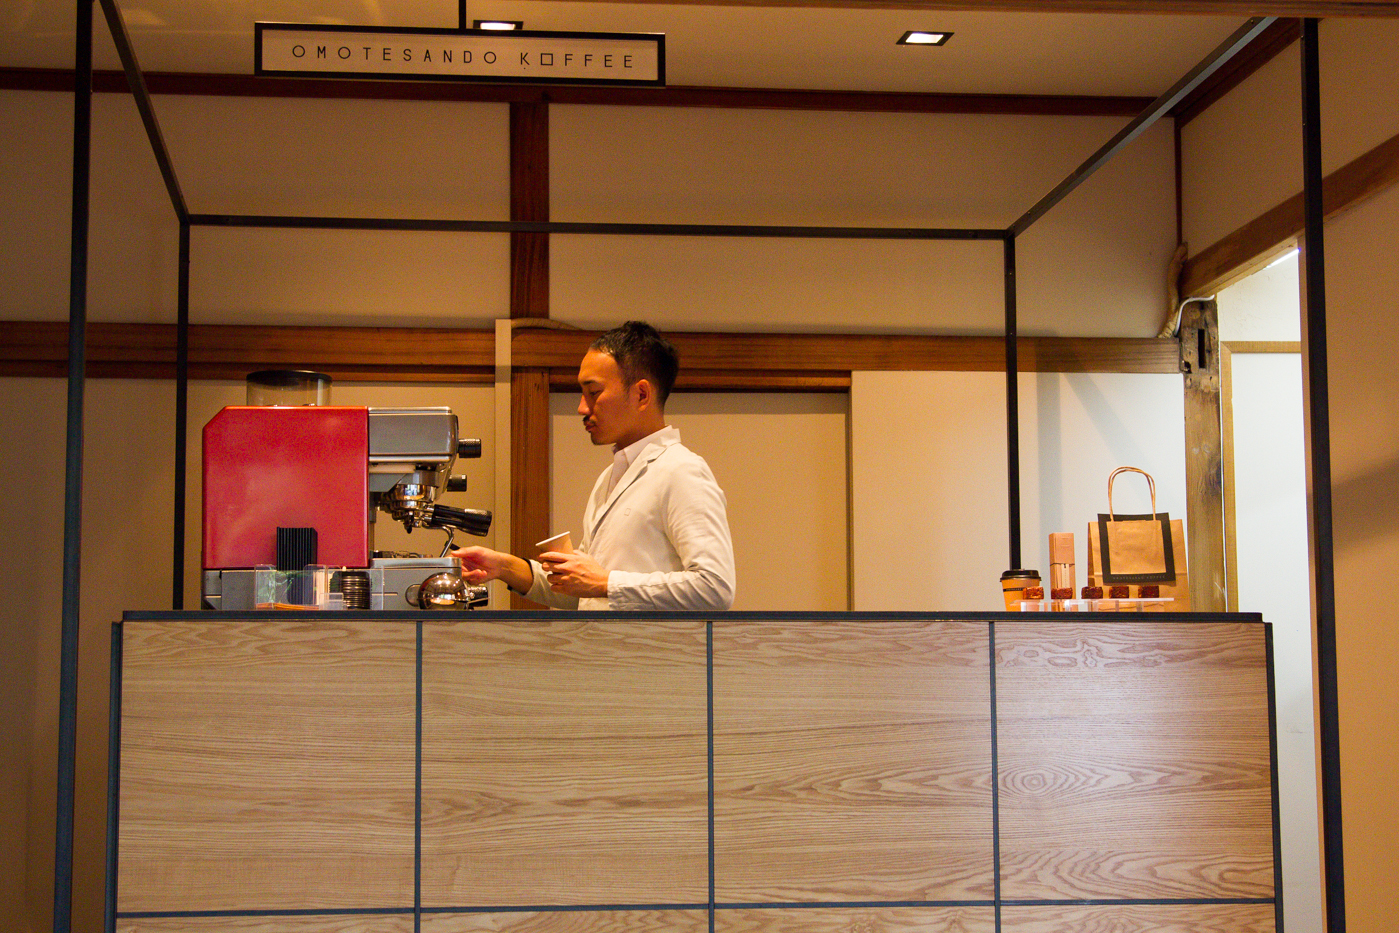 omotesa koffee counter side view of japanese barista